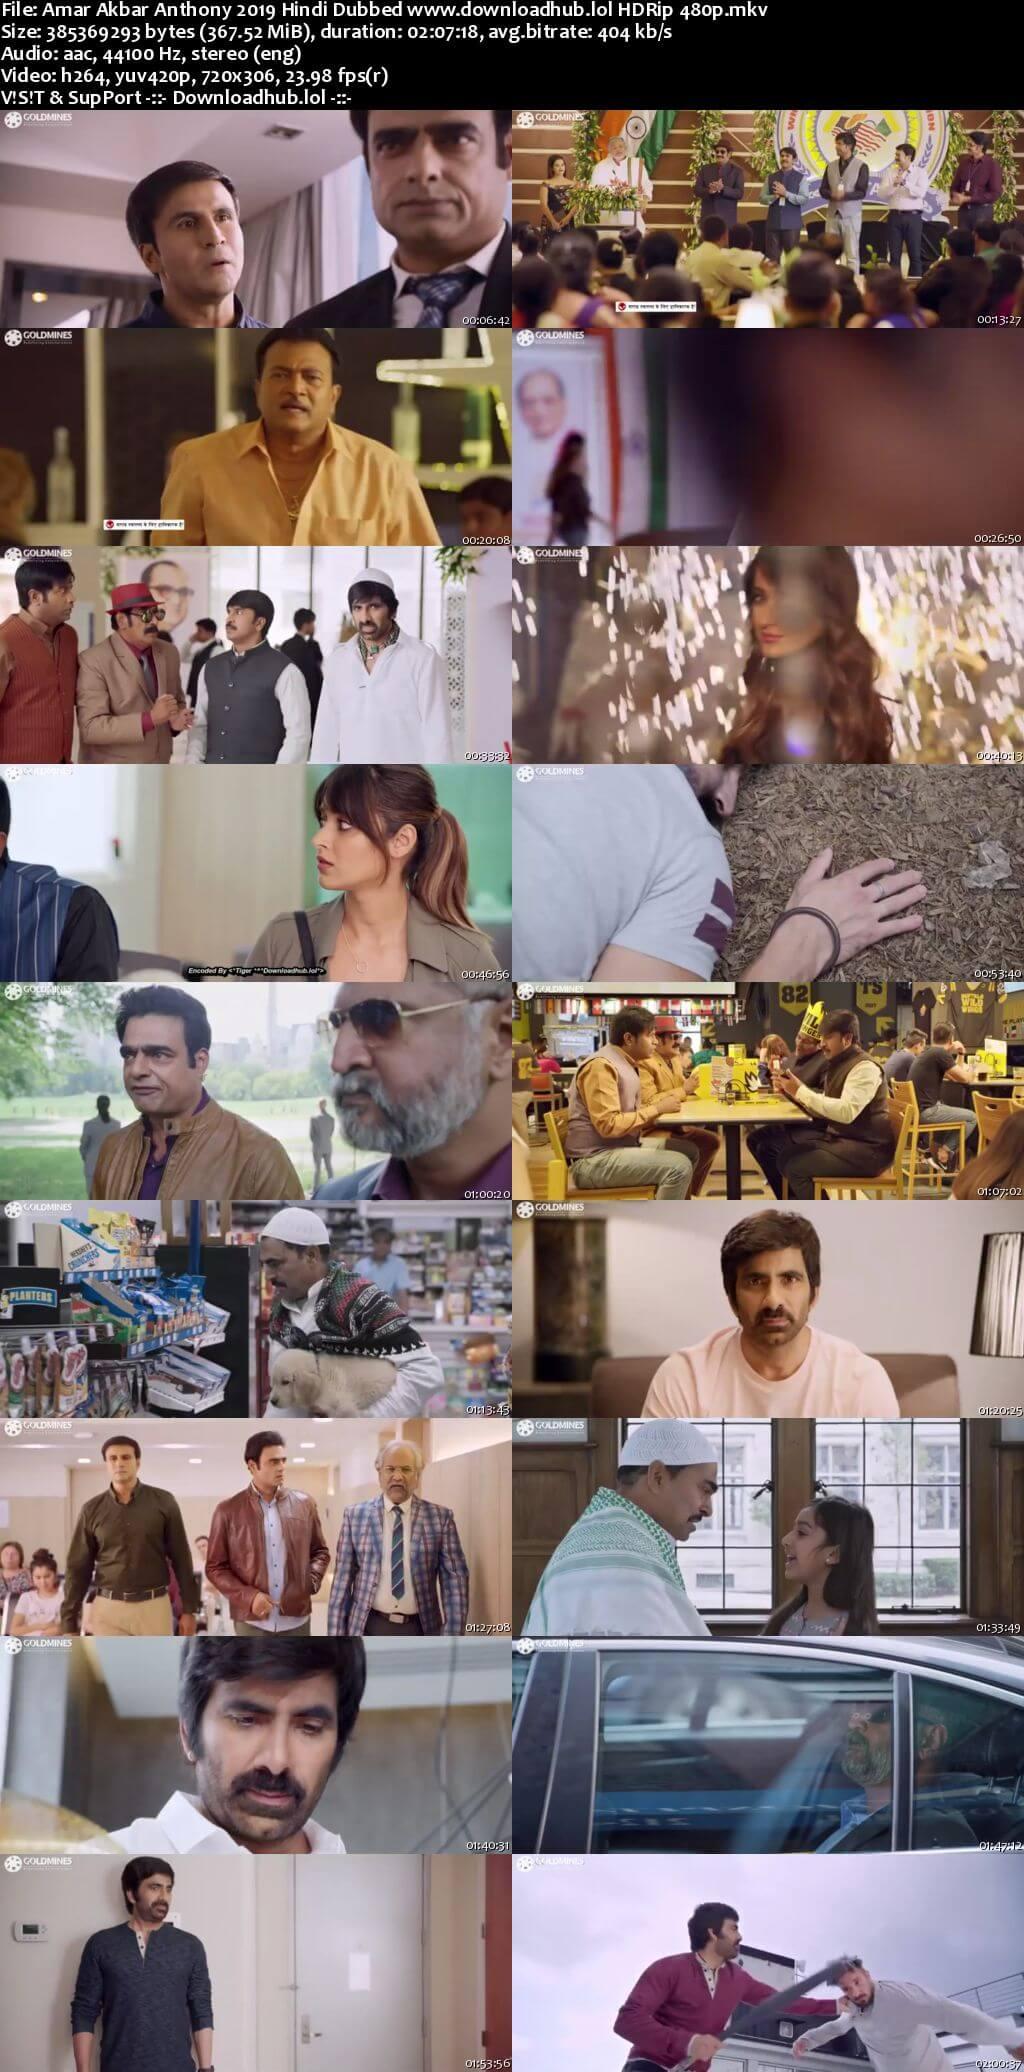 Amar Akbar Anthony 2019 Hindi Dubbed 350MB HDRip 480p